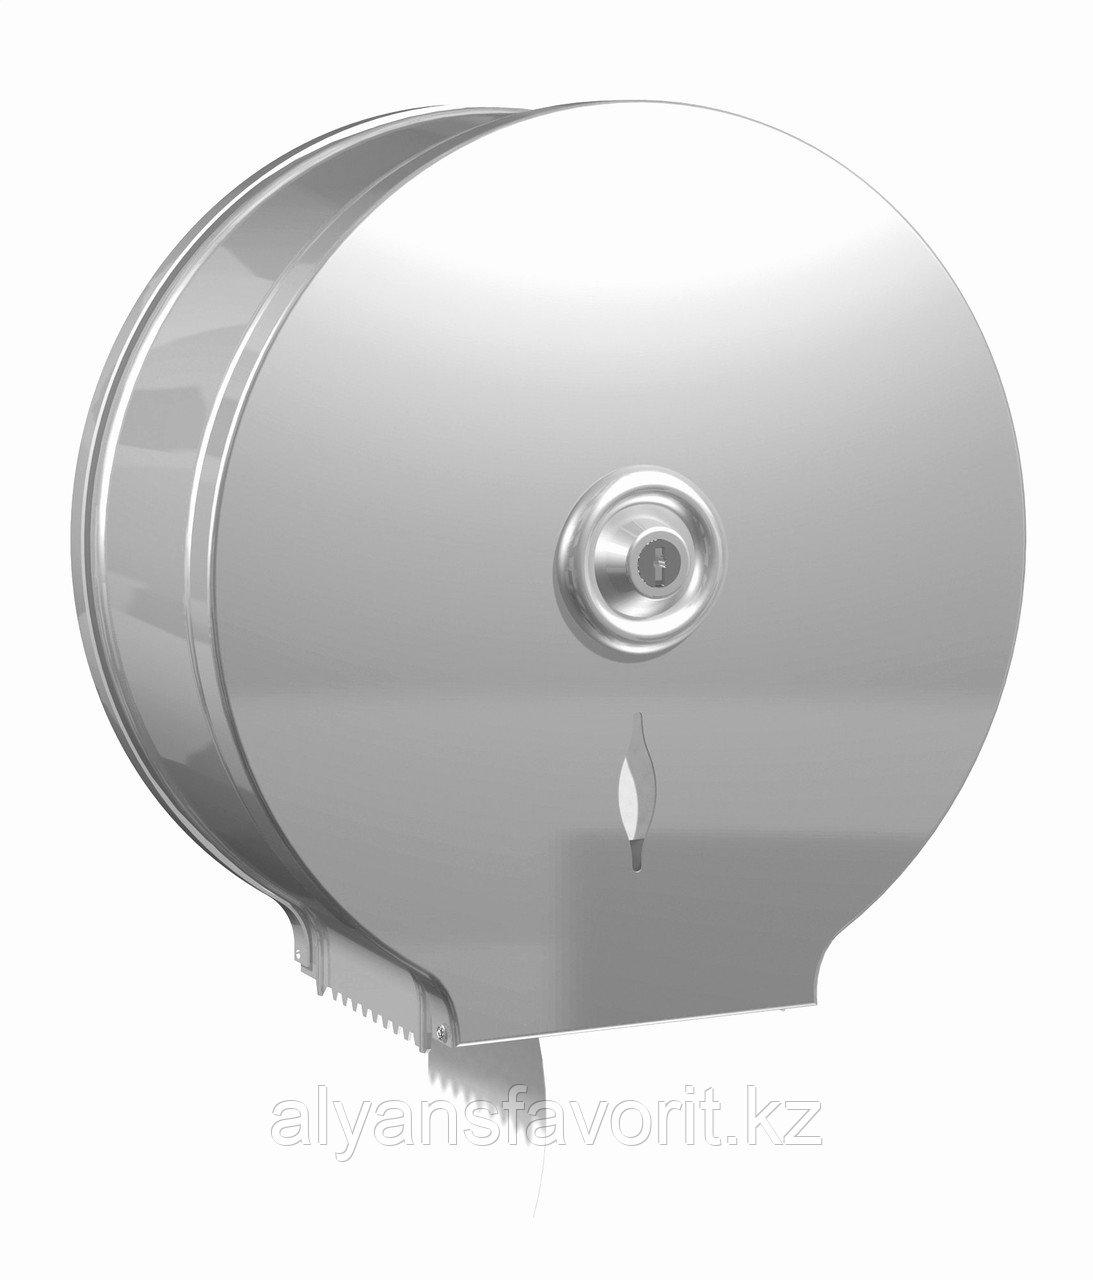 Диспенсер для туалетной бумаги Jumbo (Джамбо) металлический.Daycometal